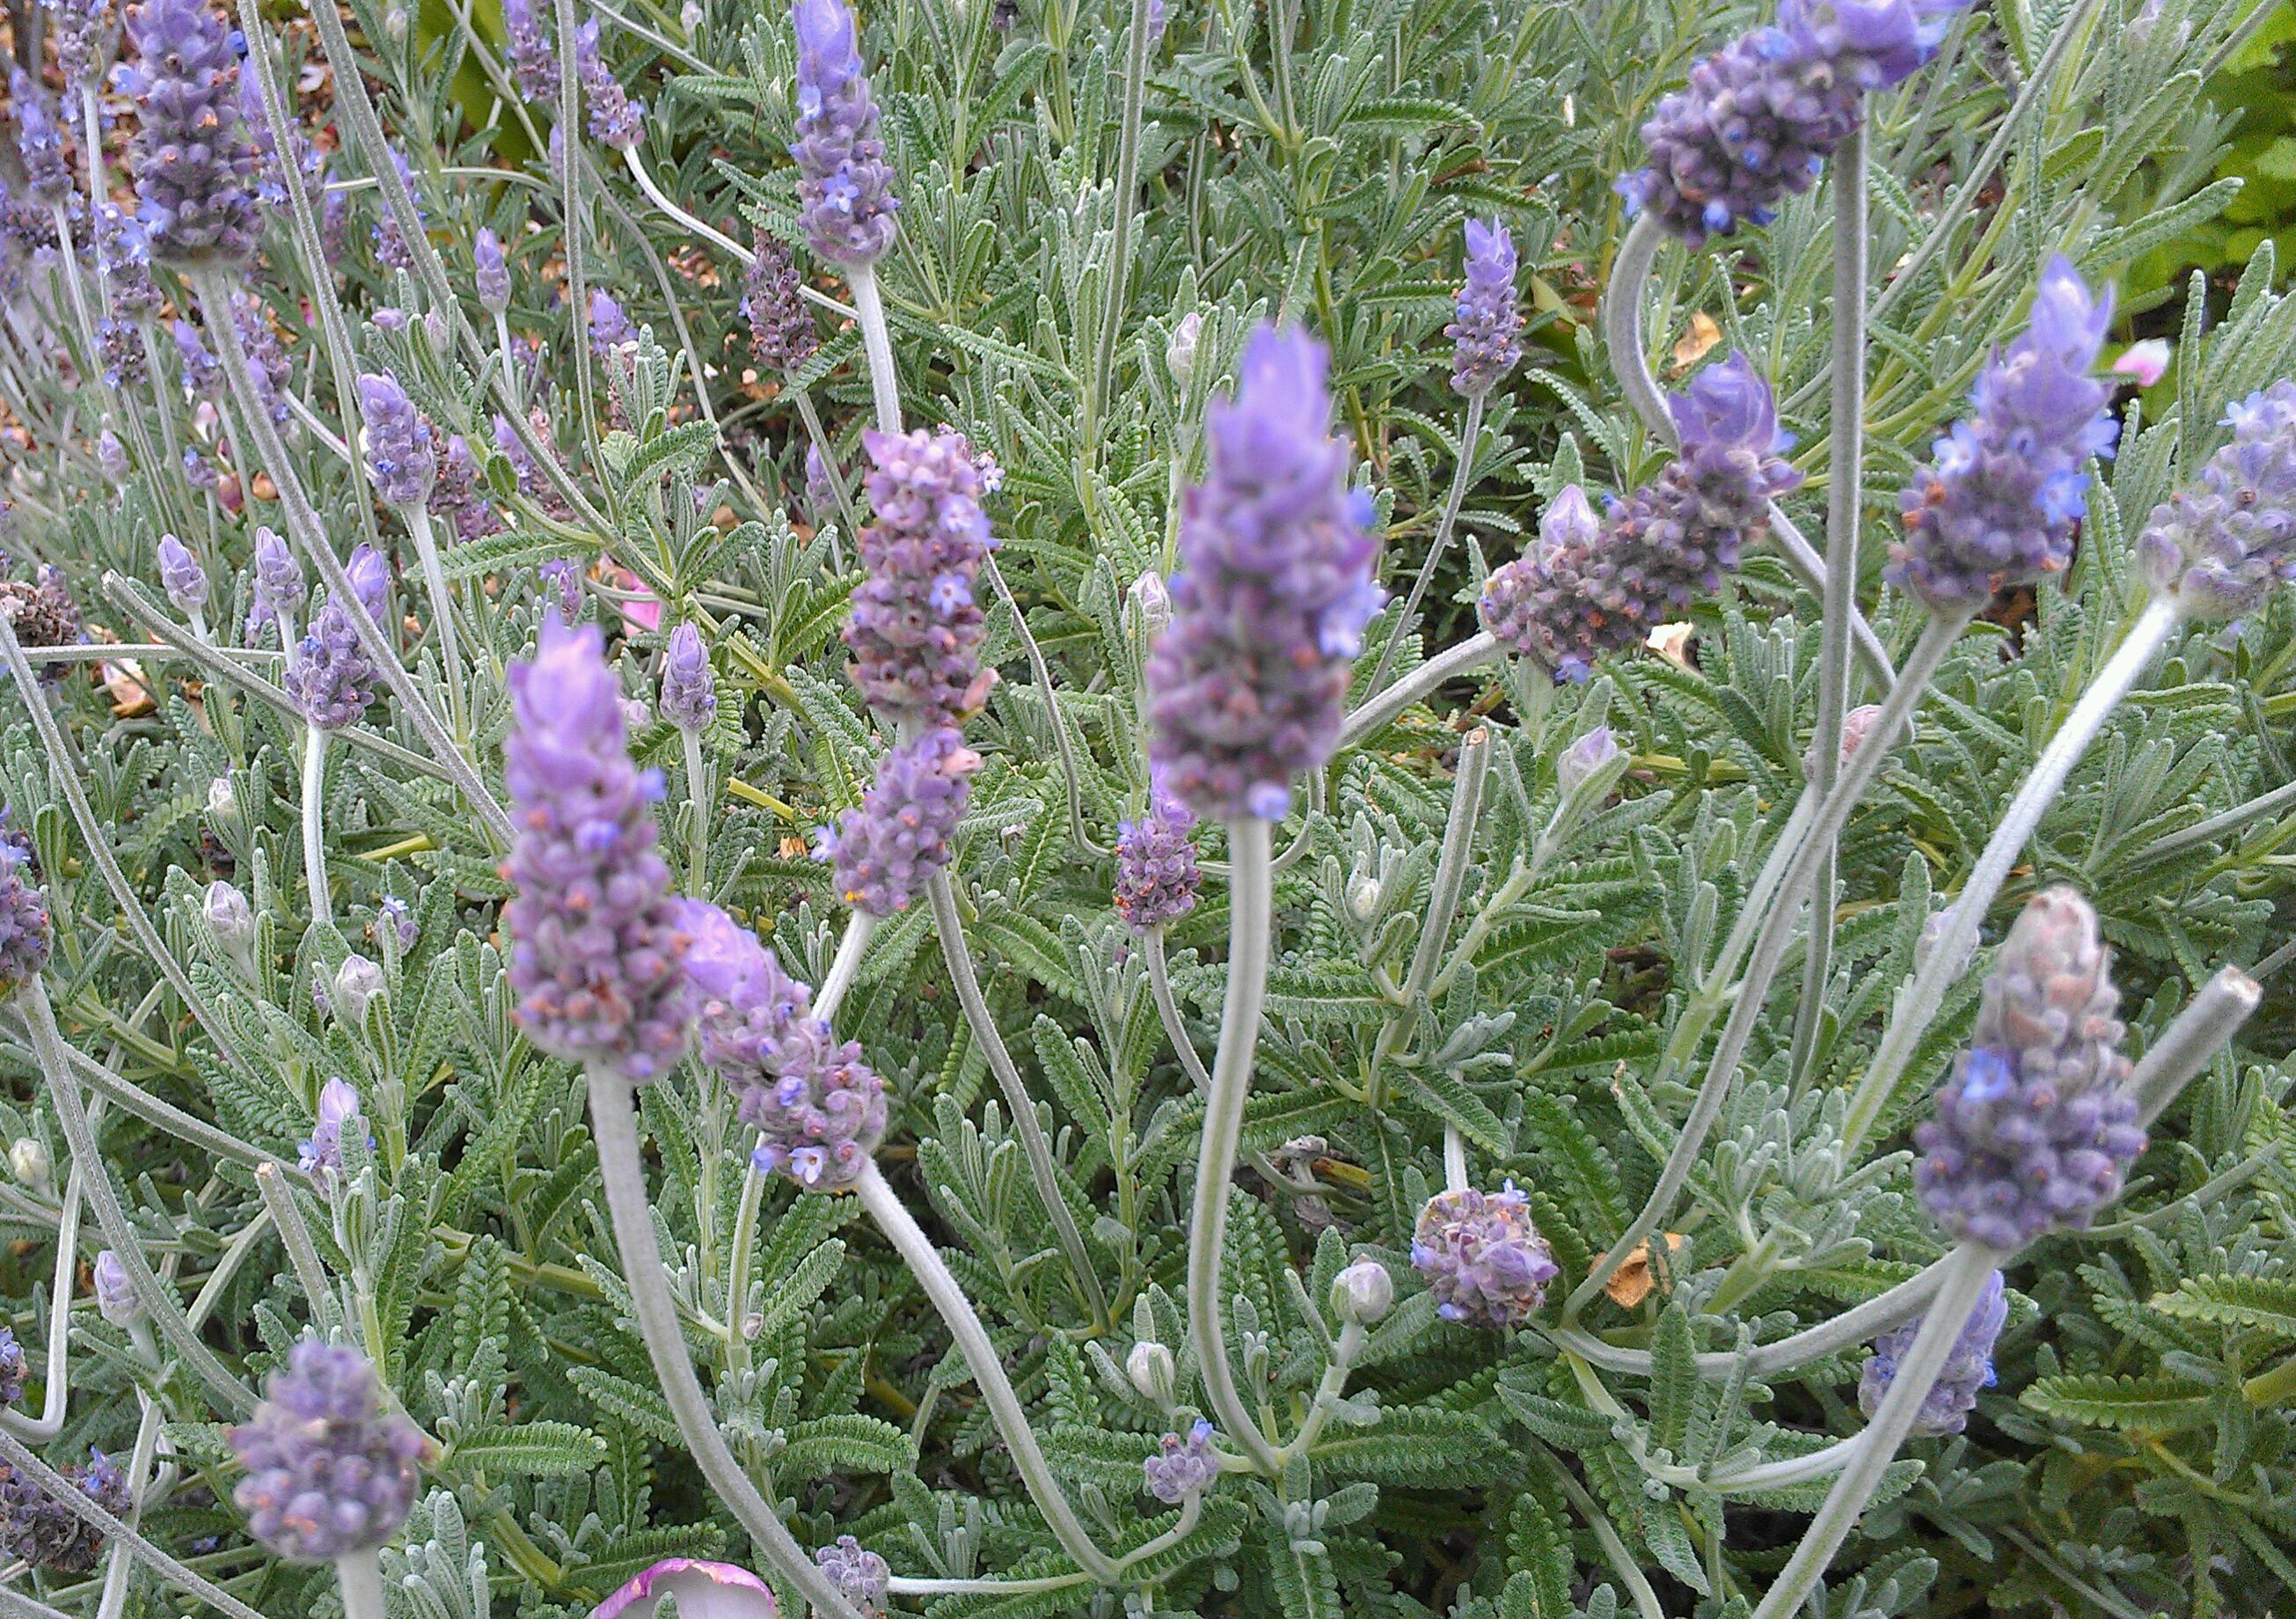 DIY Organic Lavender Body Scrub for Sun-Drenched Skin